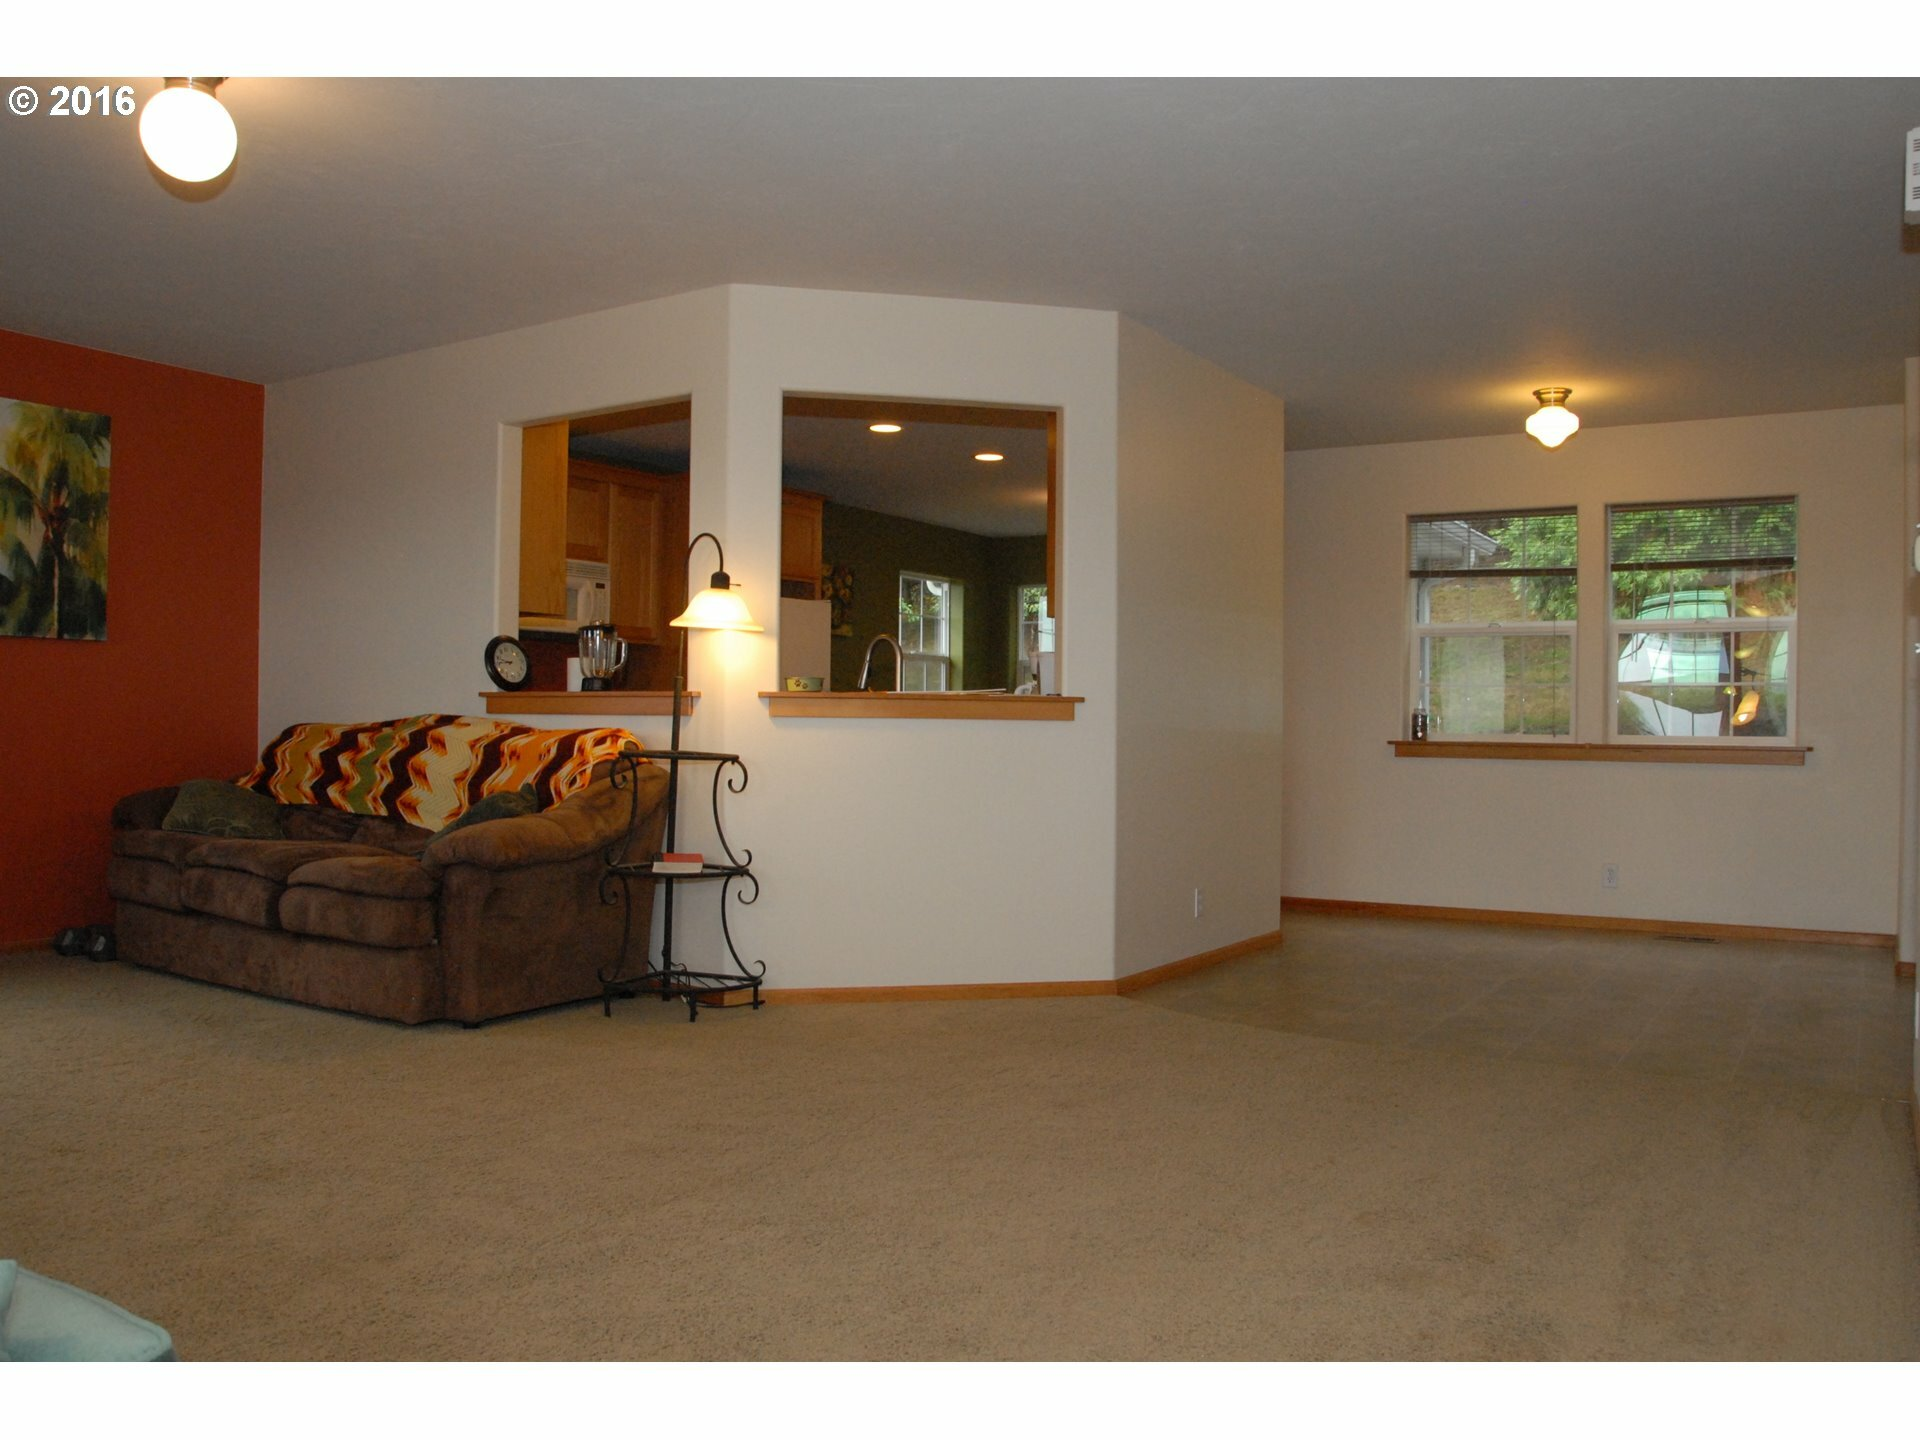 83725 S Morningstar Rd, Creswell, OR - USA (photo 3)